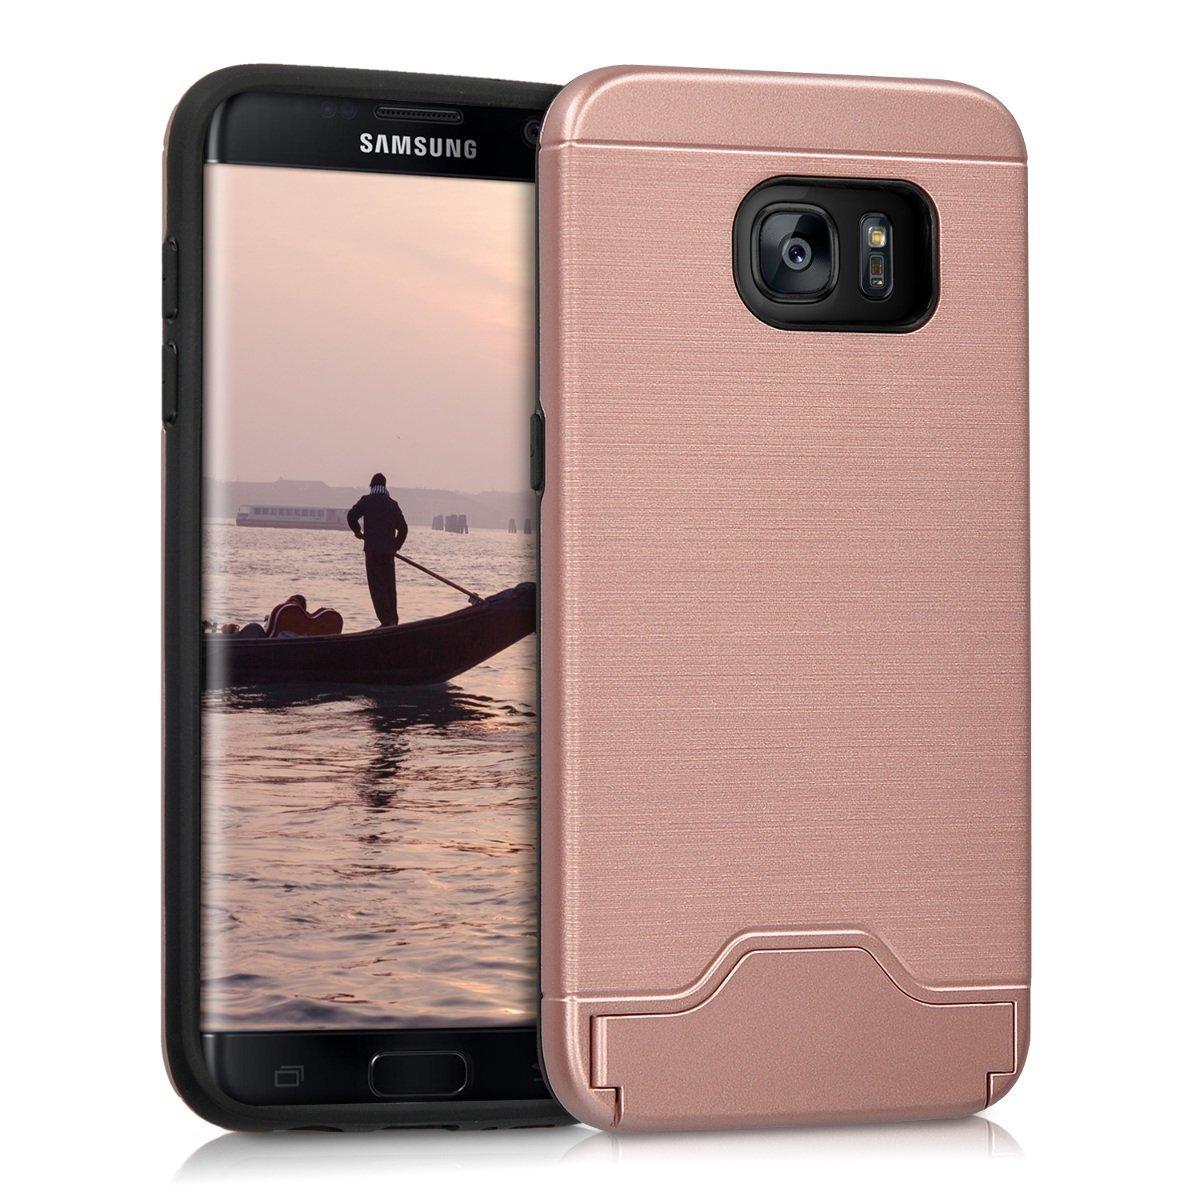 KW Θήκη Αλουμινίου Samsung Galaxy S7 Edge - Pink Gold (38932.02)